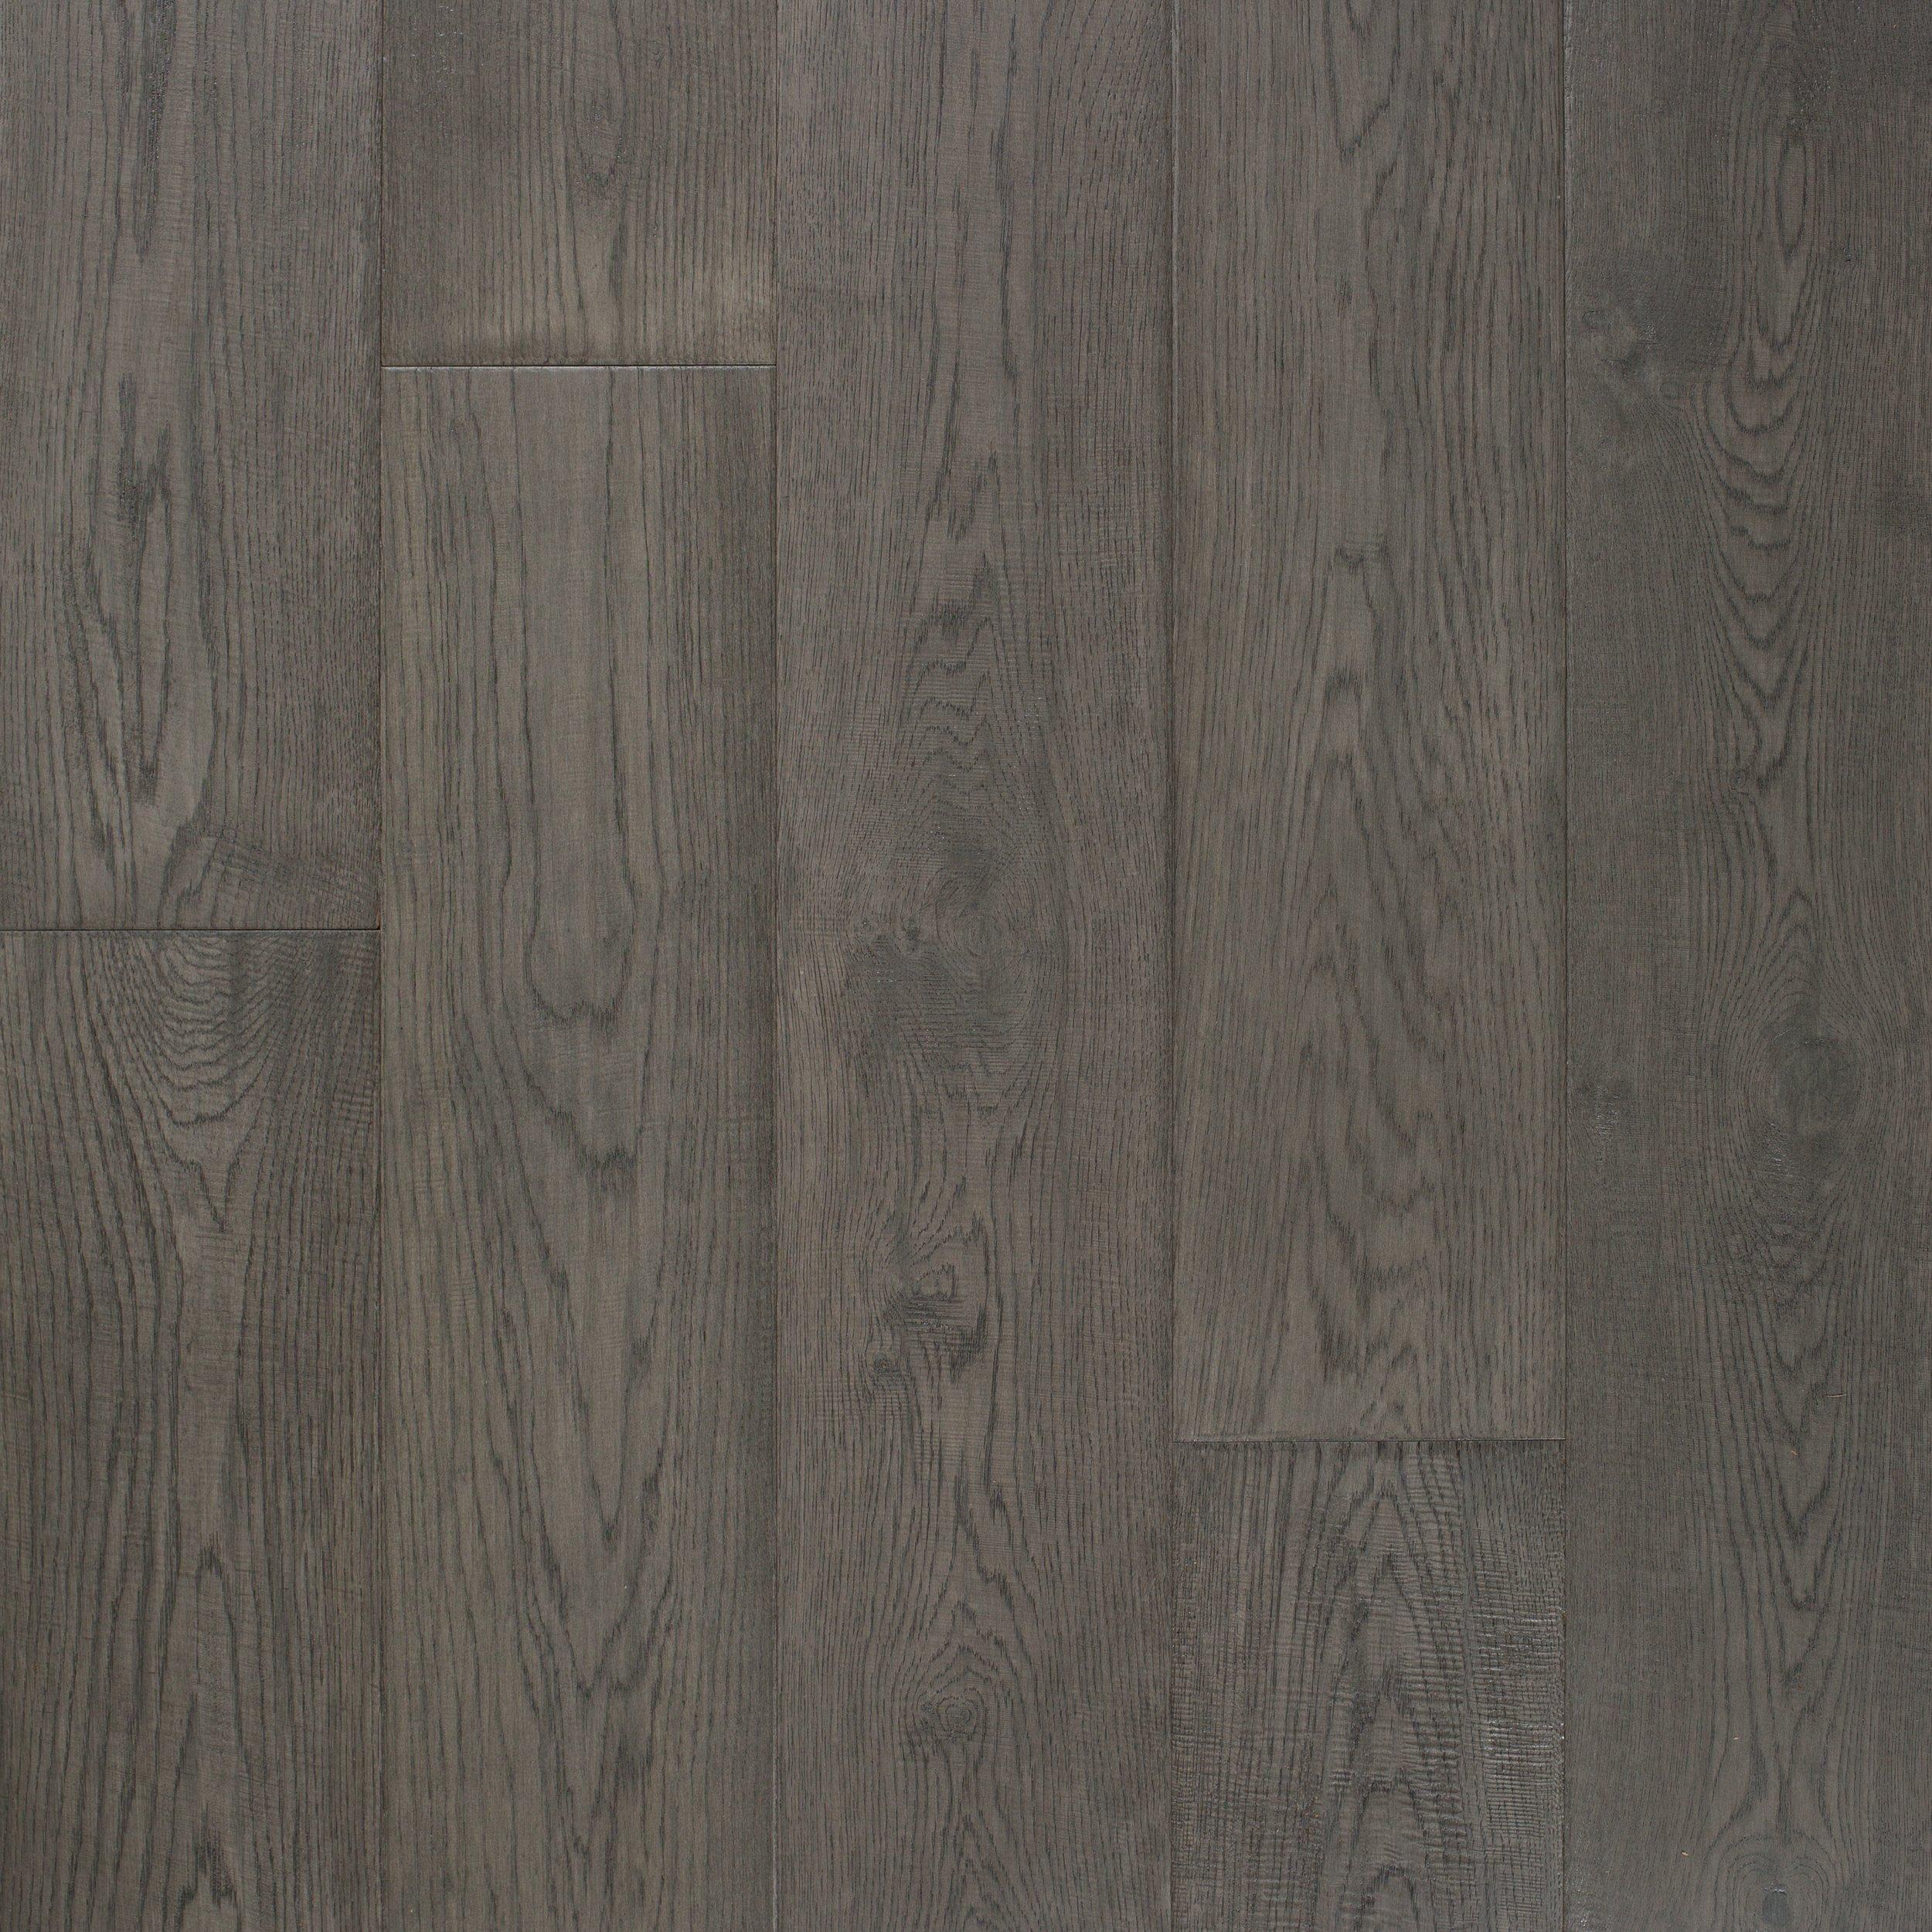 Tobacco Oak Distressed Locking Engineered Hardwood In 2020